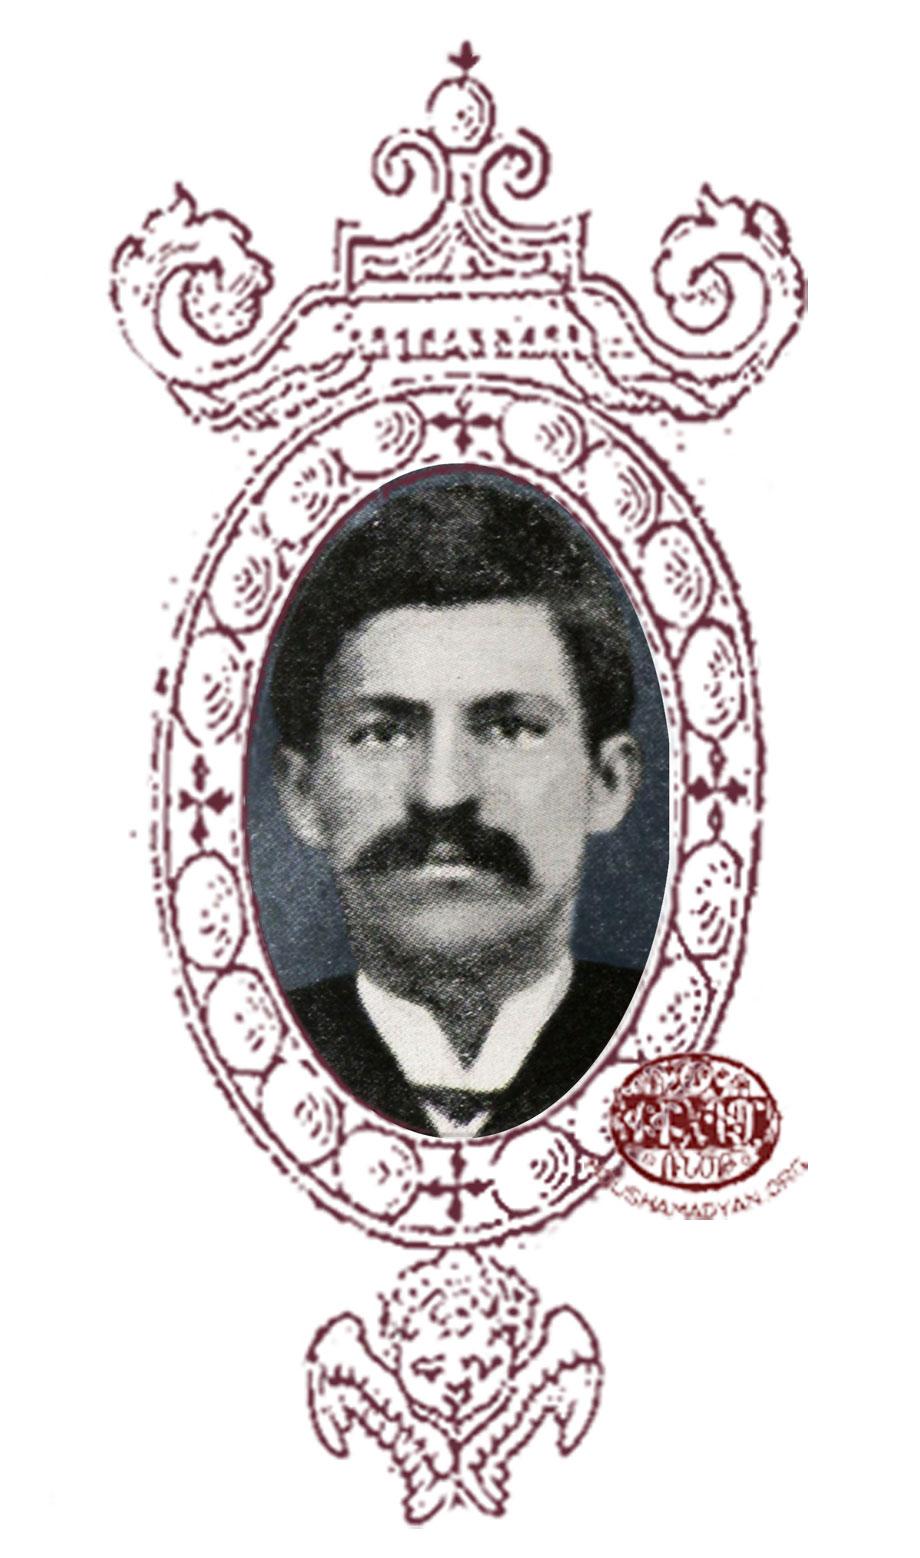 Hovhannes Kaboulian